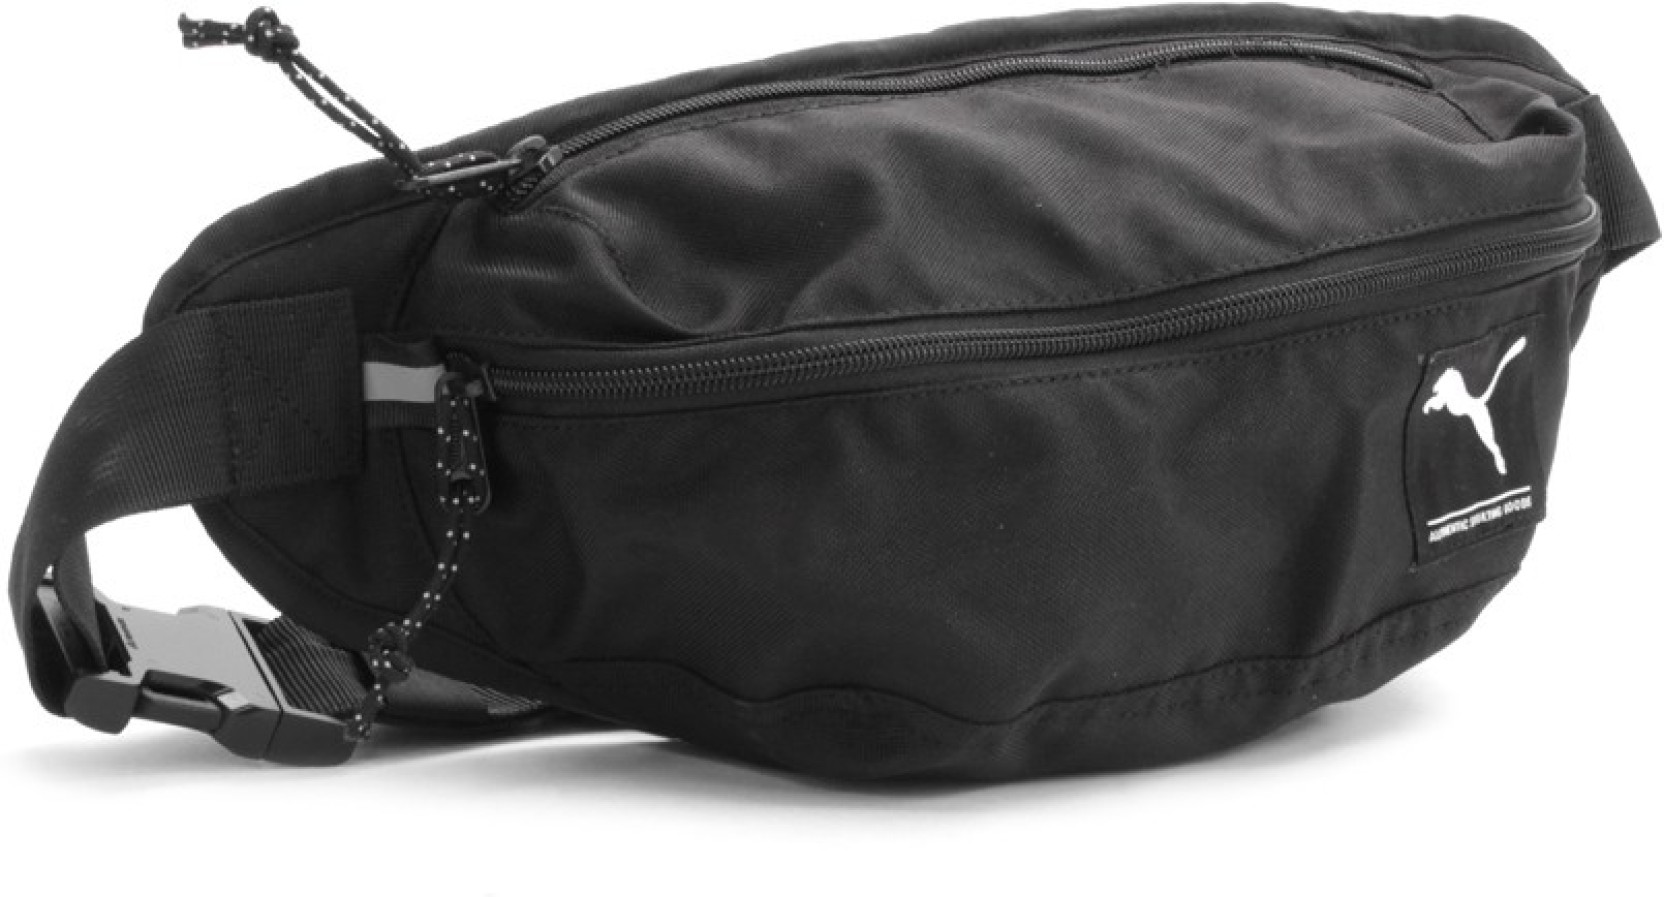 eda861b943f9 Puma Waist Bag Black - Price in India